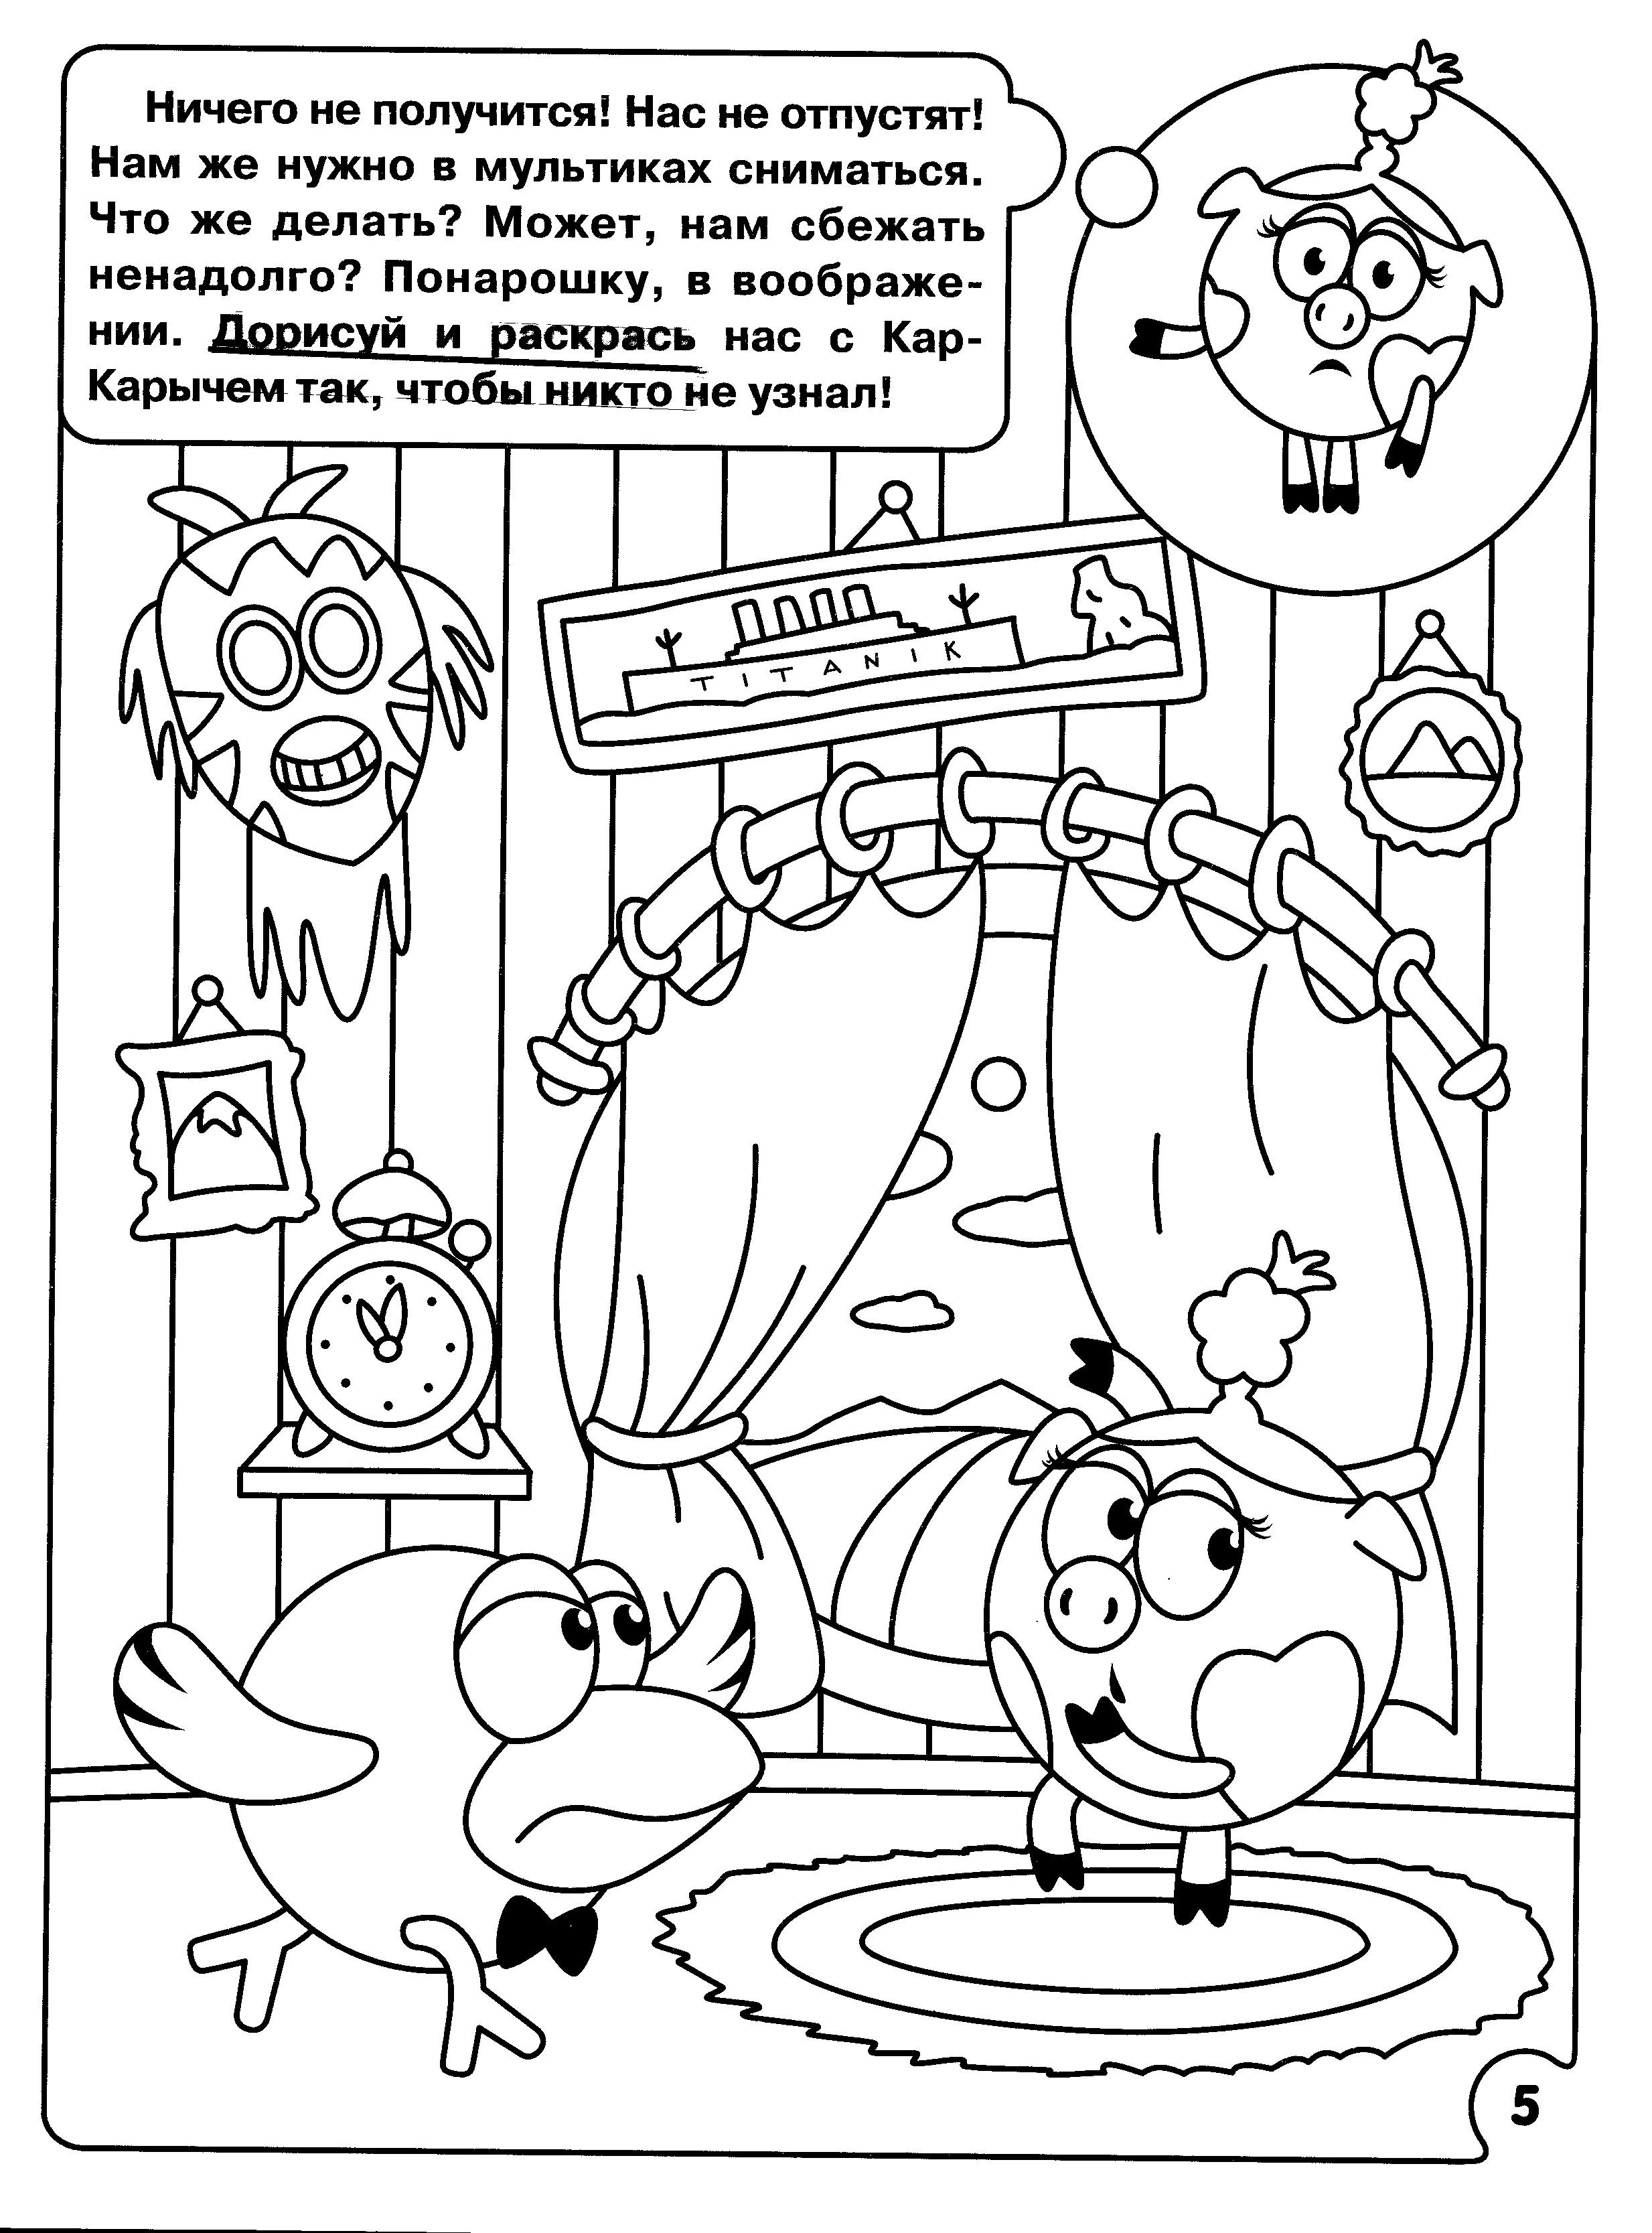 Развивающие раскраски для детей - смешарики » Развитие ...